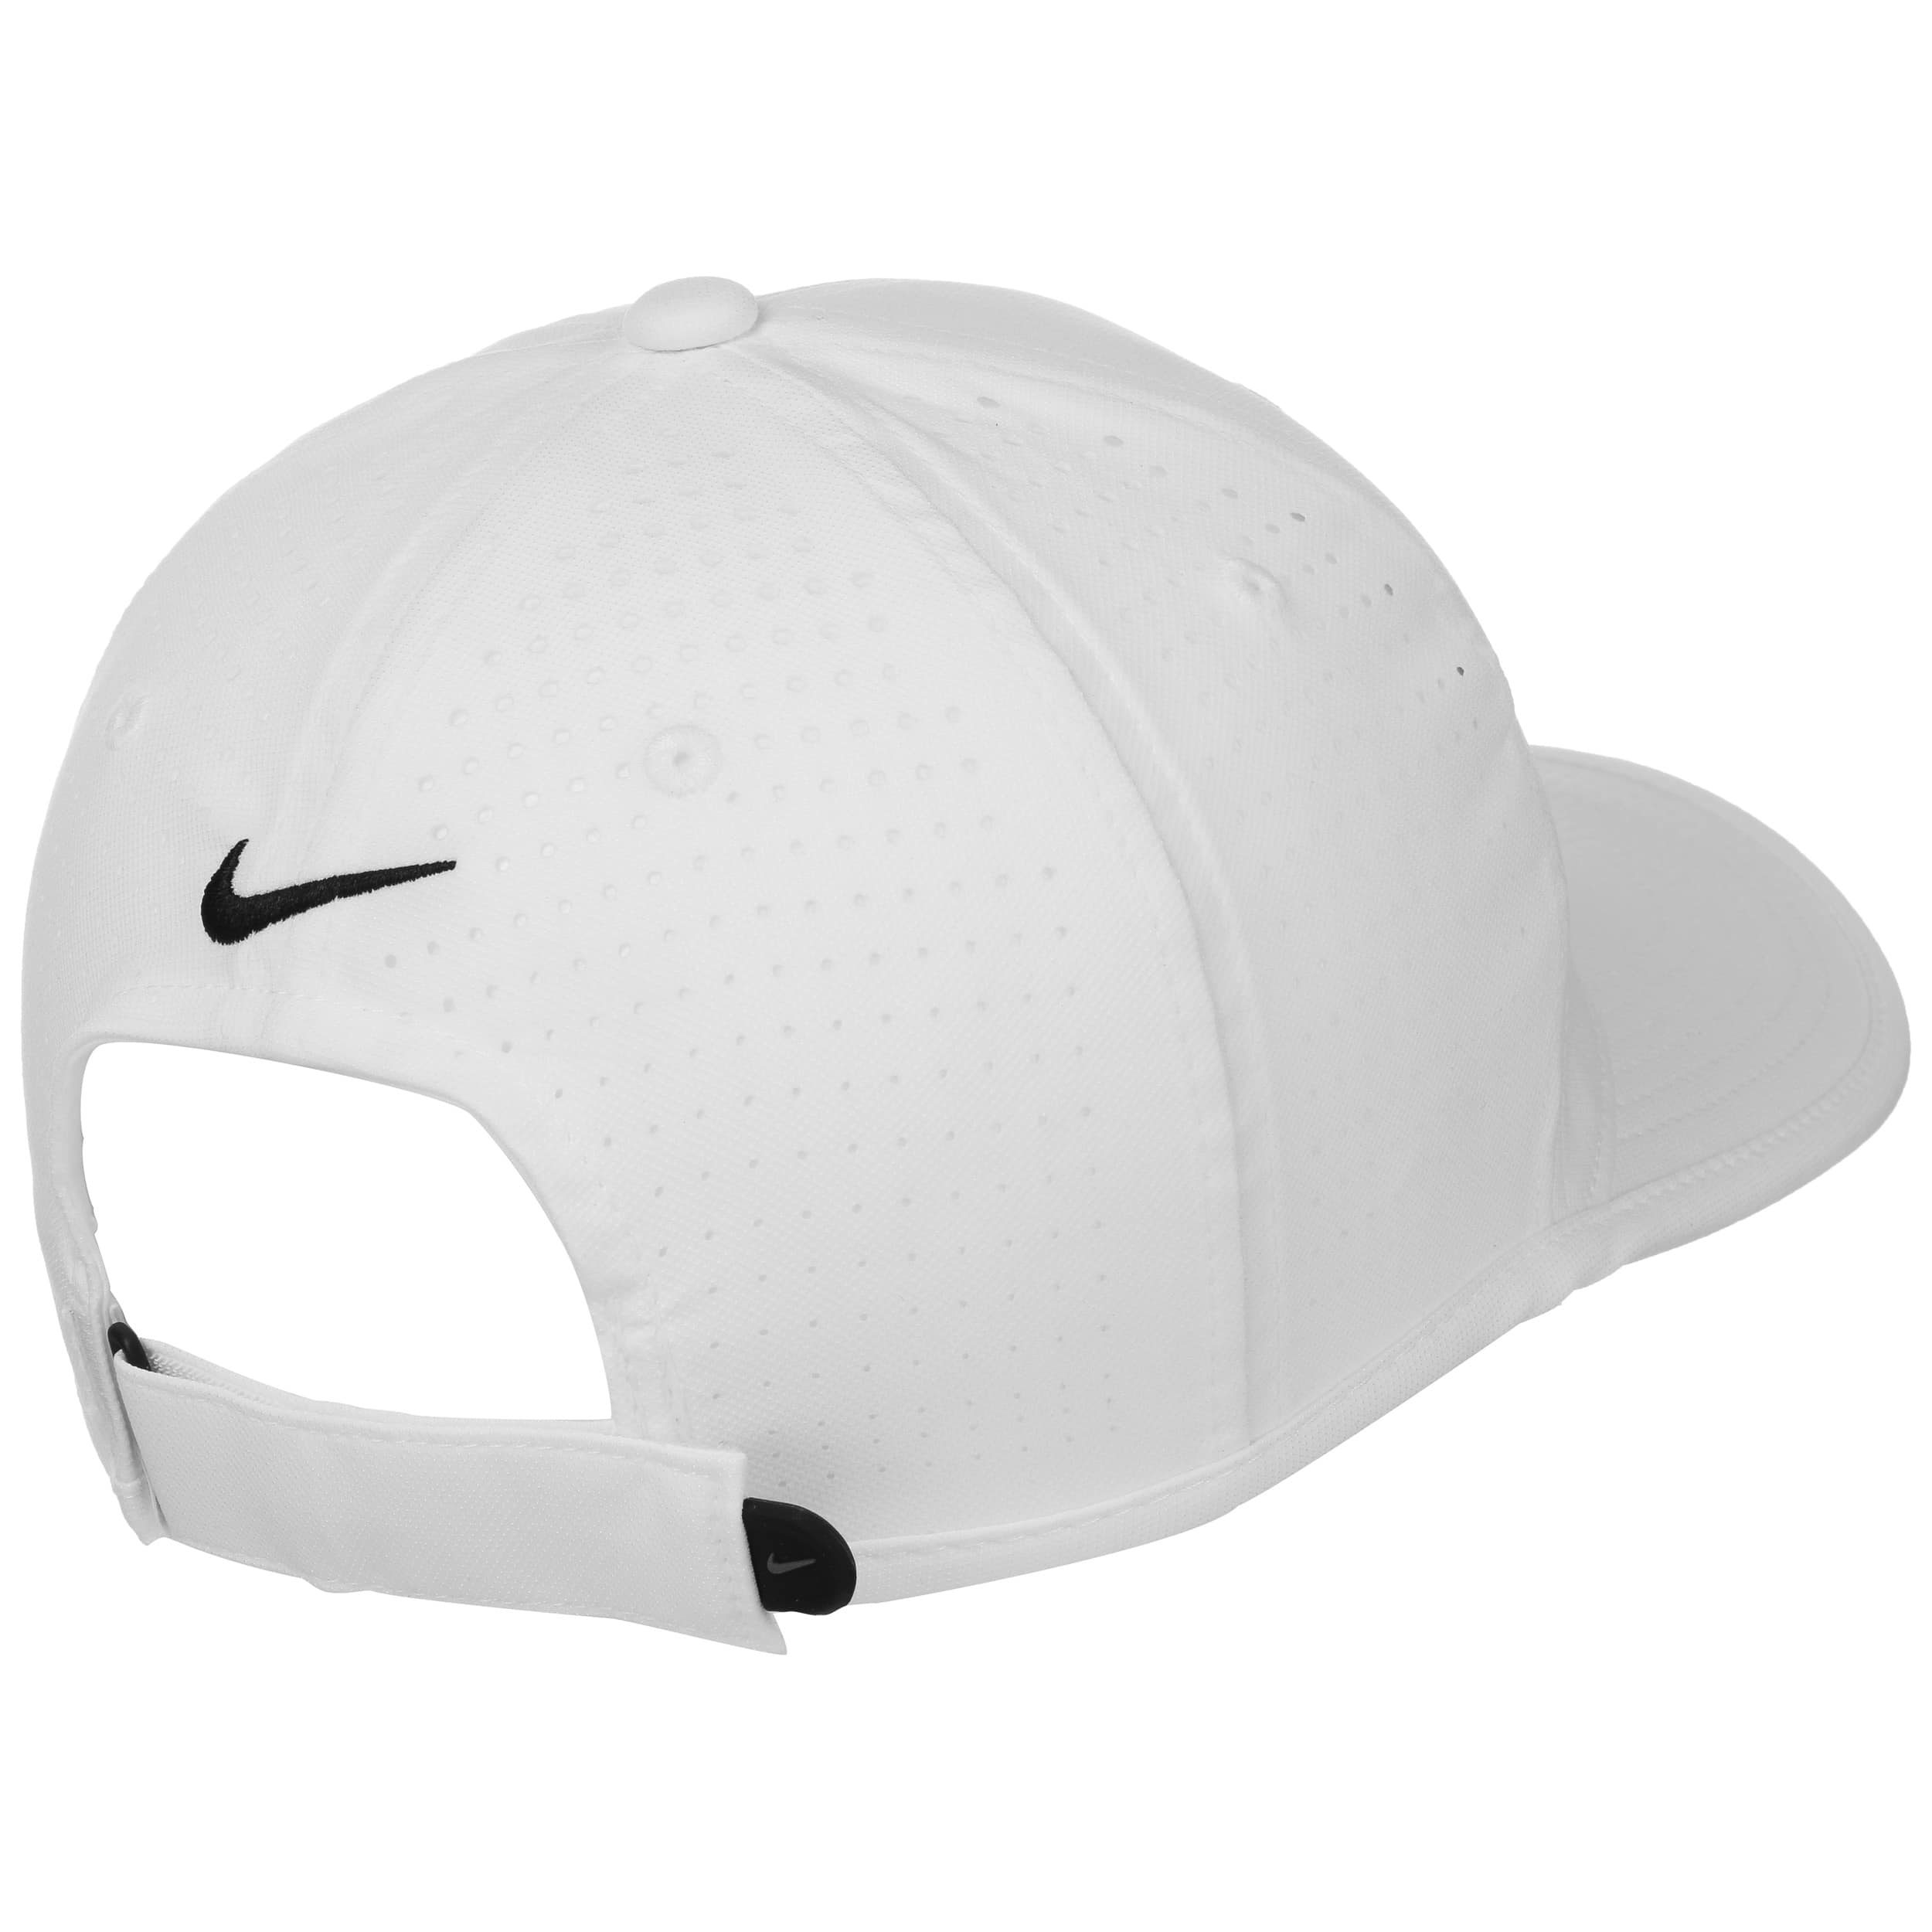 058770d68a1 ... Ultralight Tour Perforation Cap by Nike - light blue 3 ...